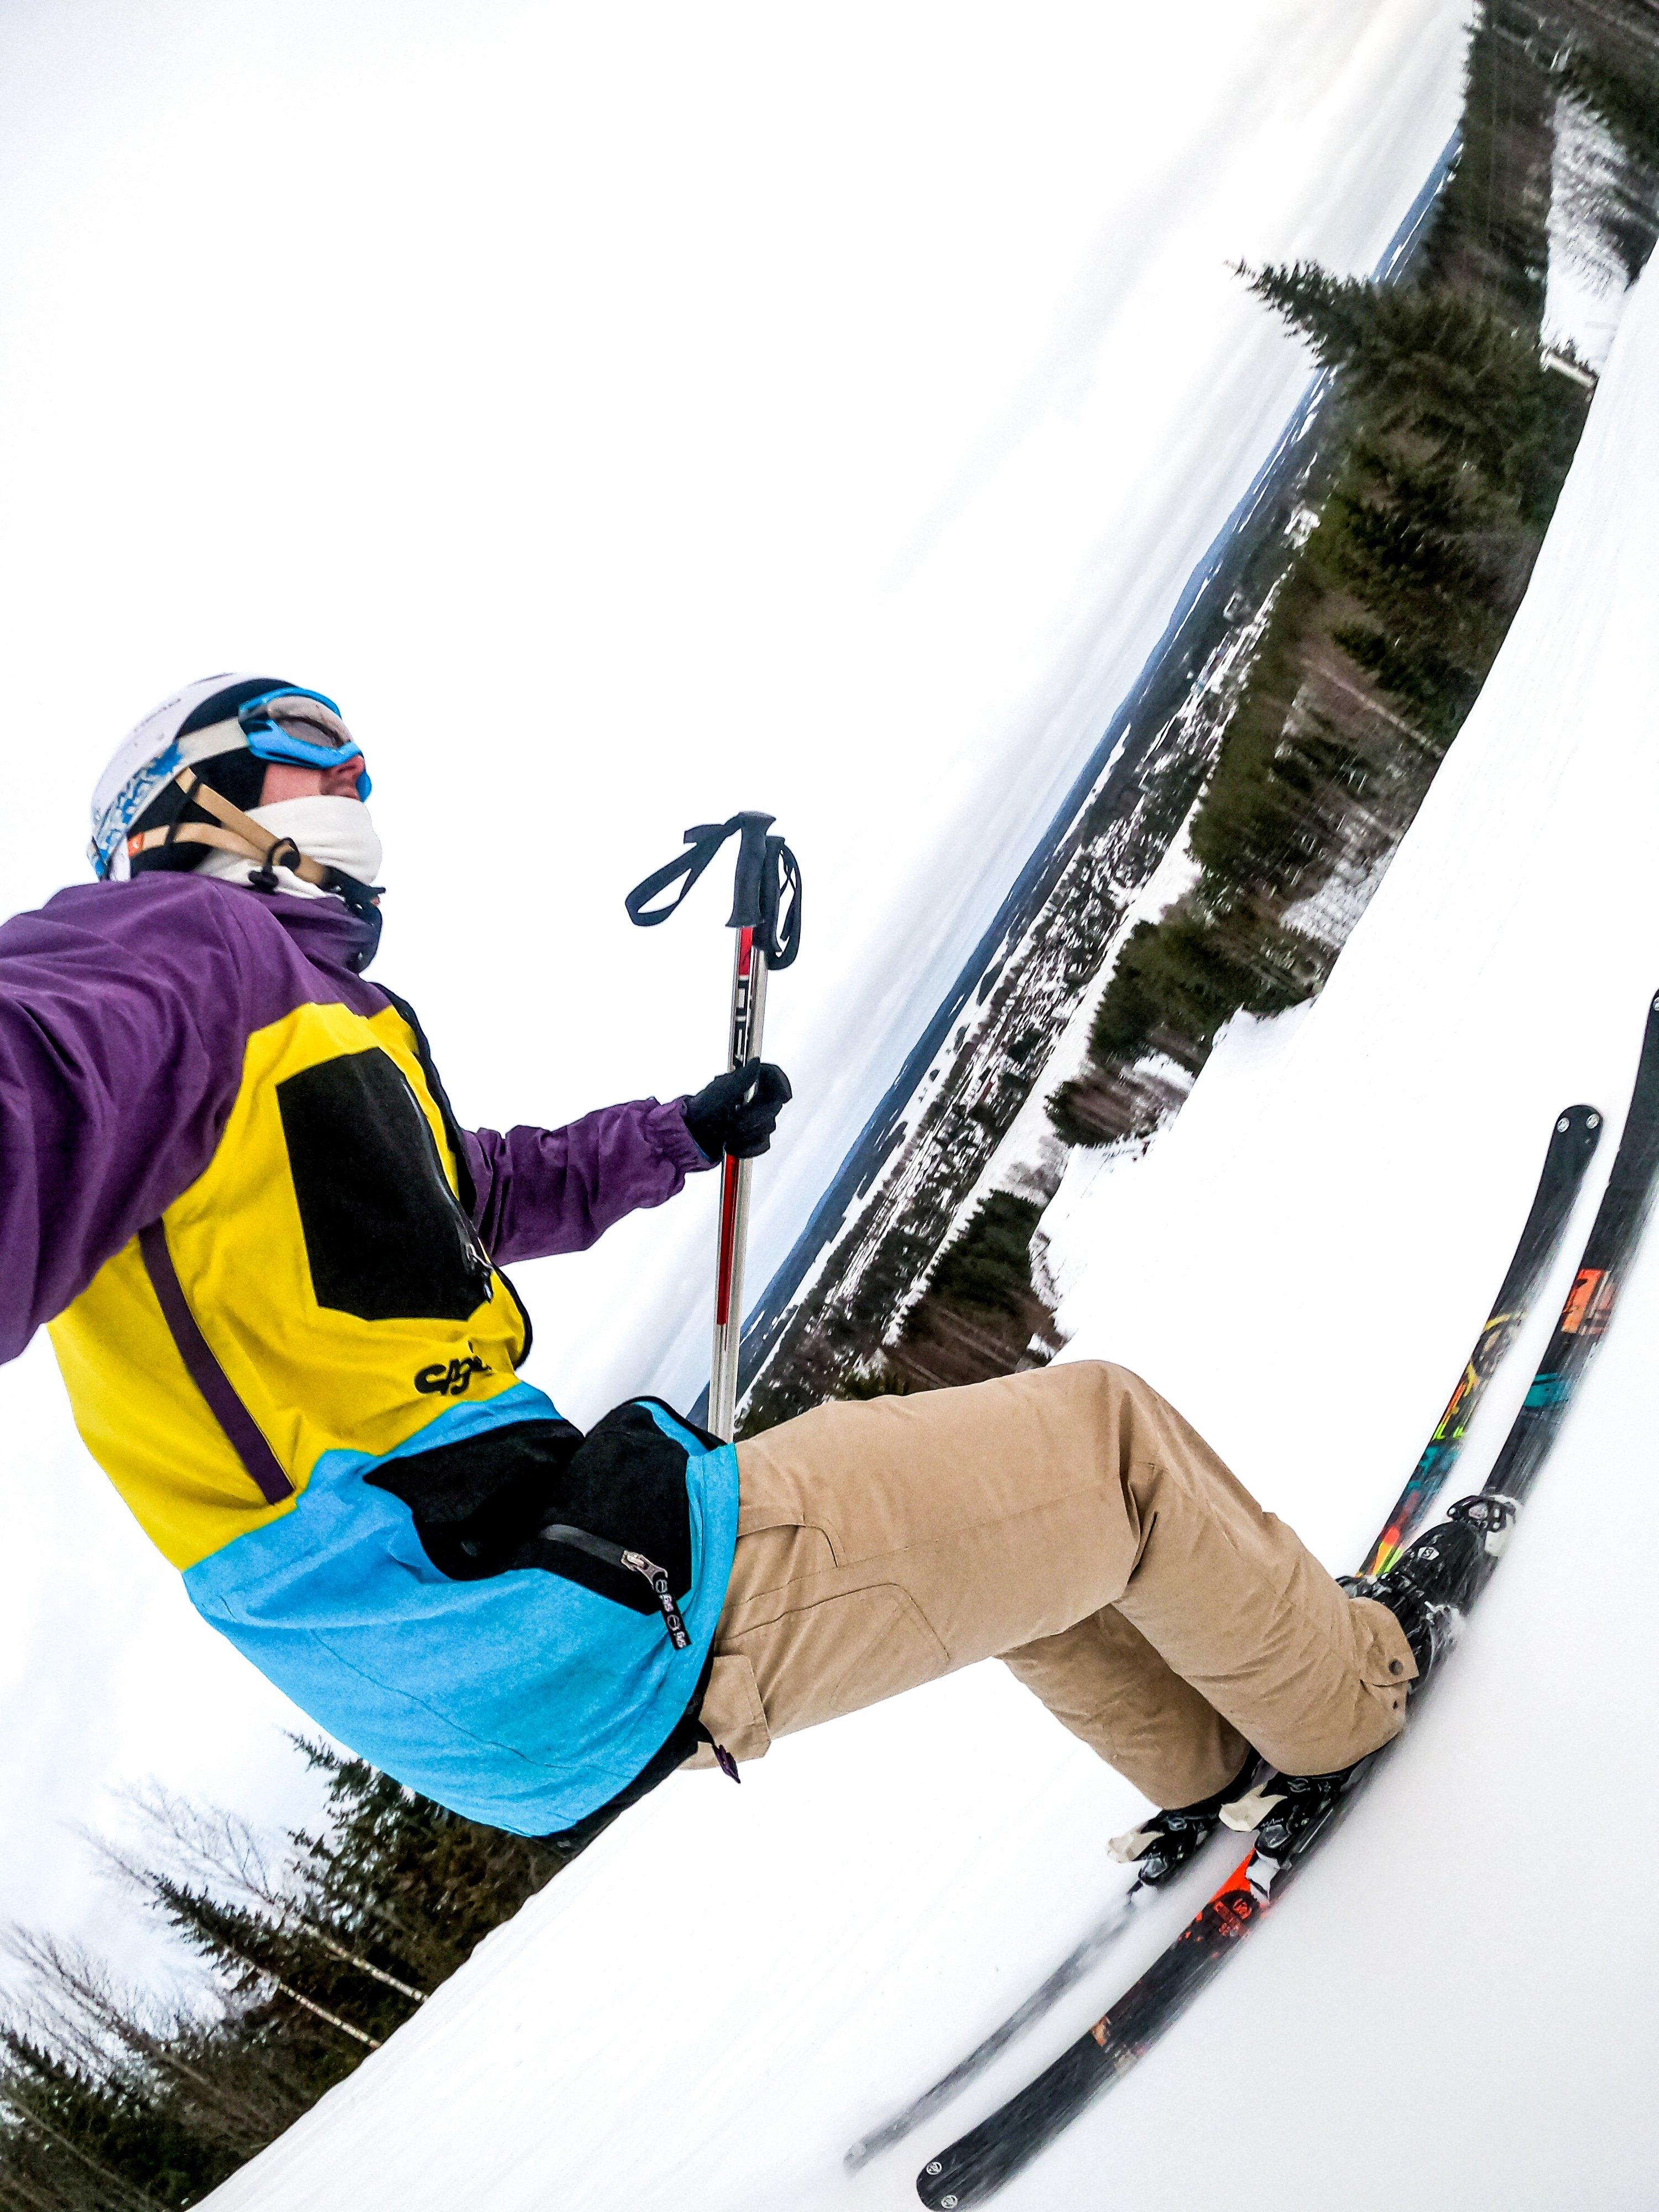 Tahko Snow Camp Risto Pirnpuu